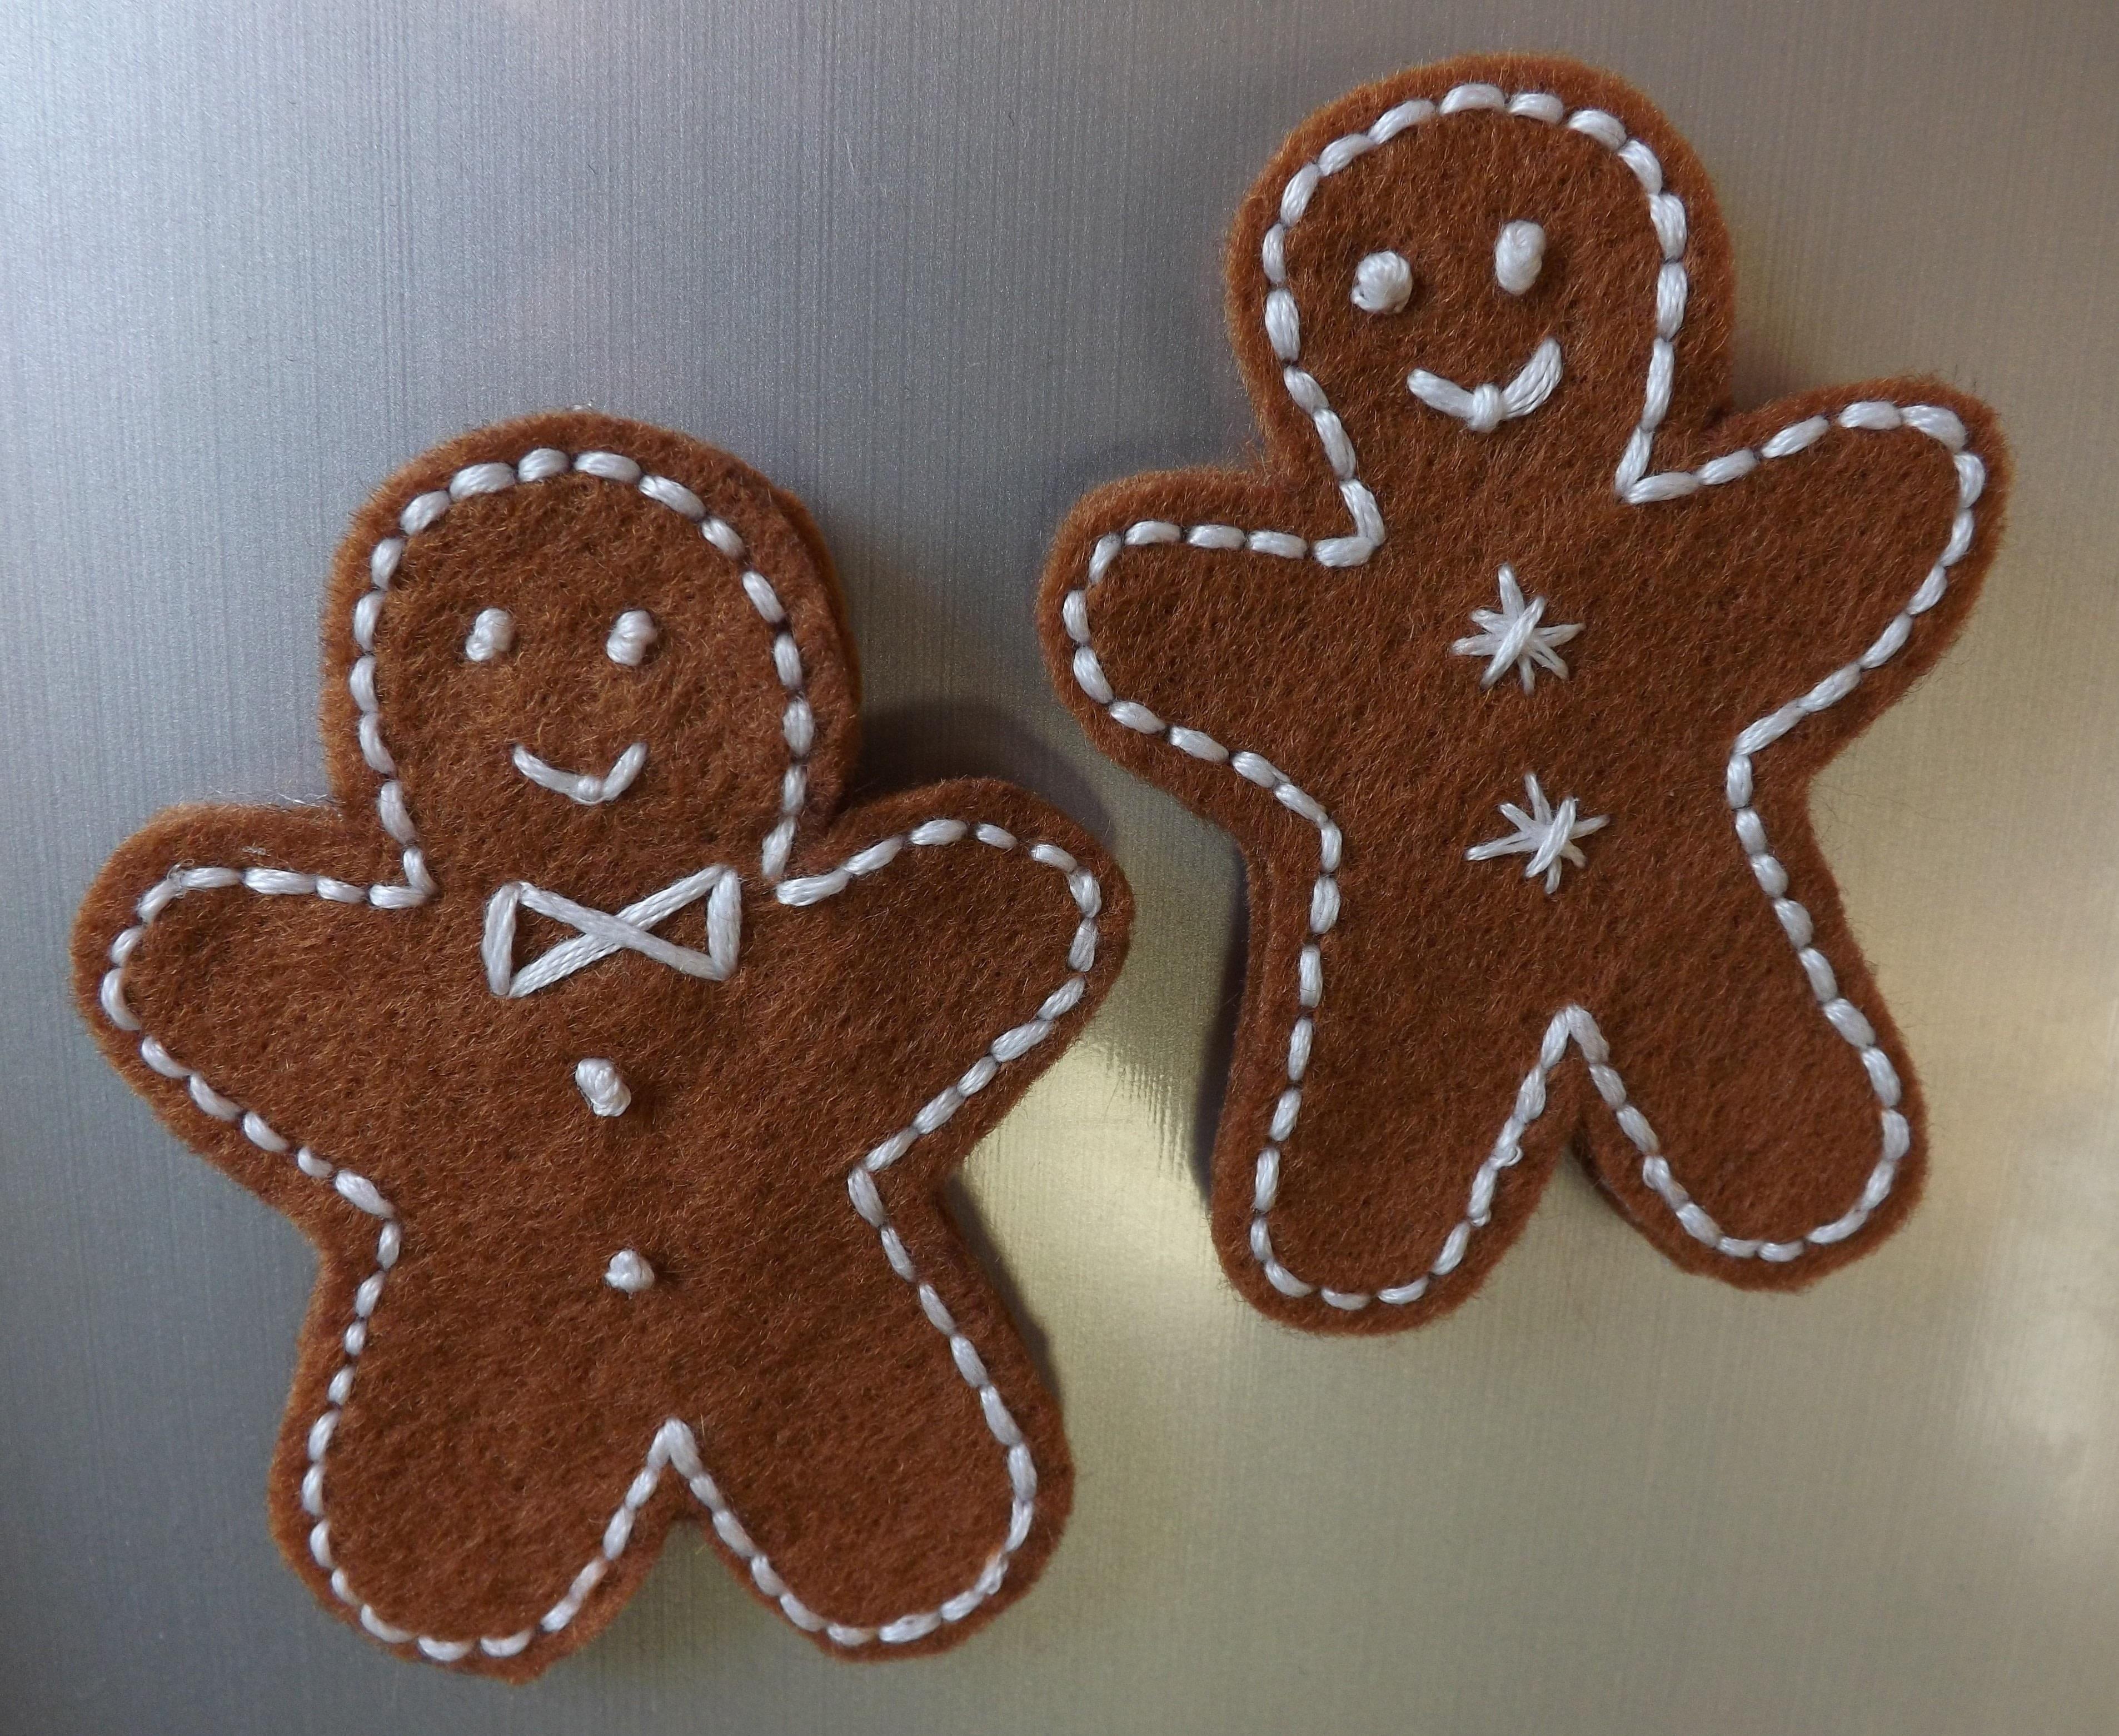 Mini Gingerbread Men Mini Gingerbread Men